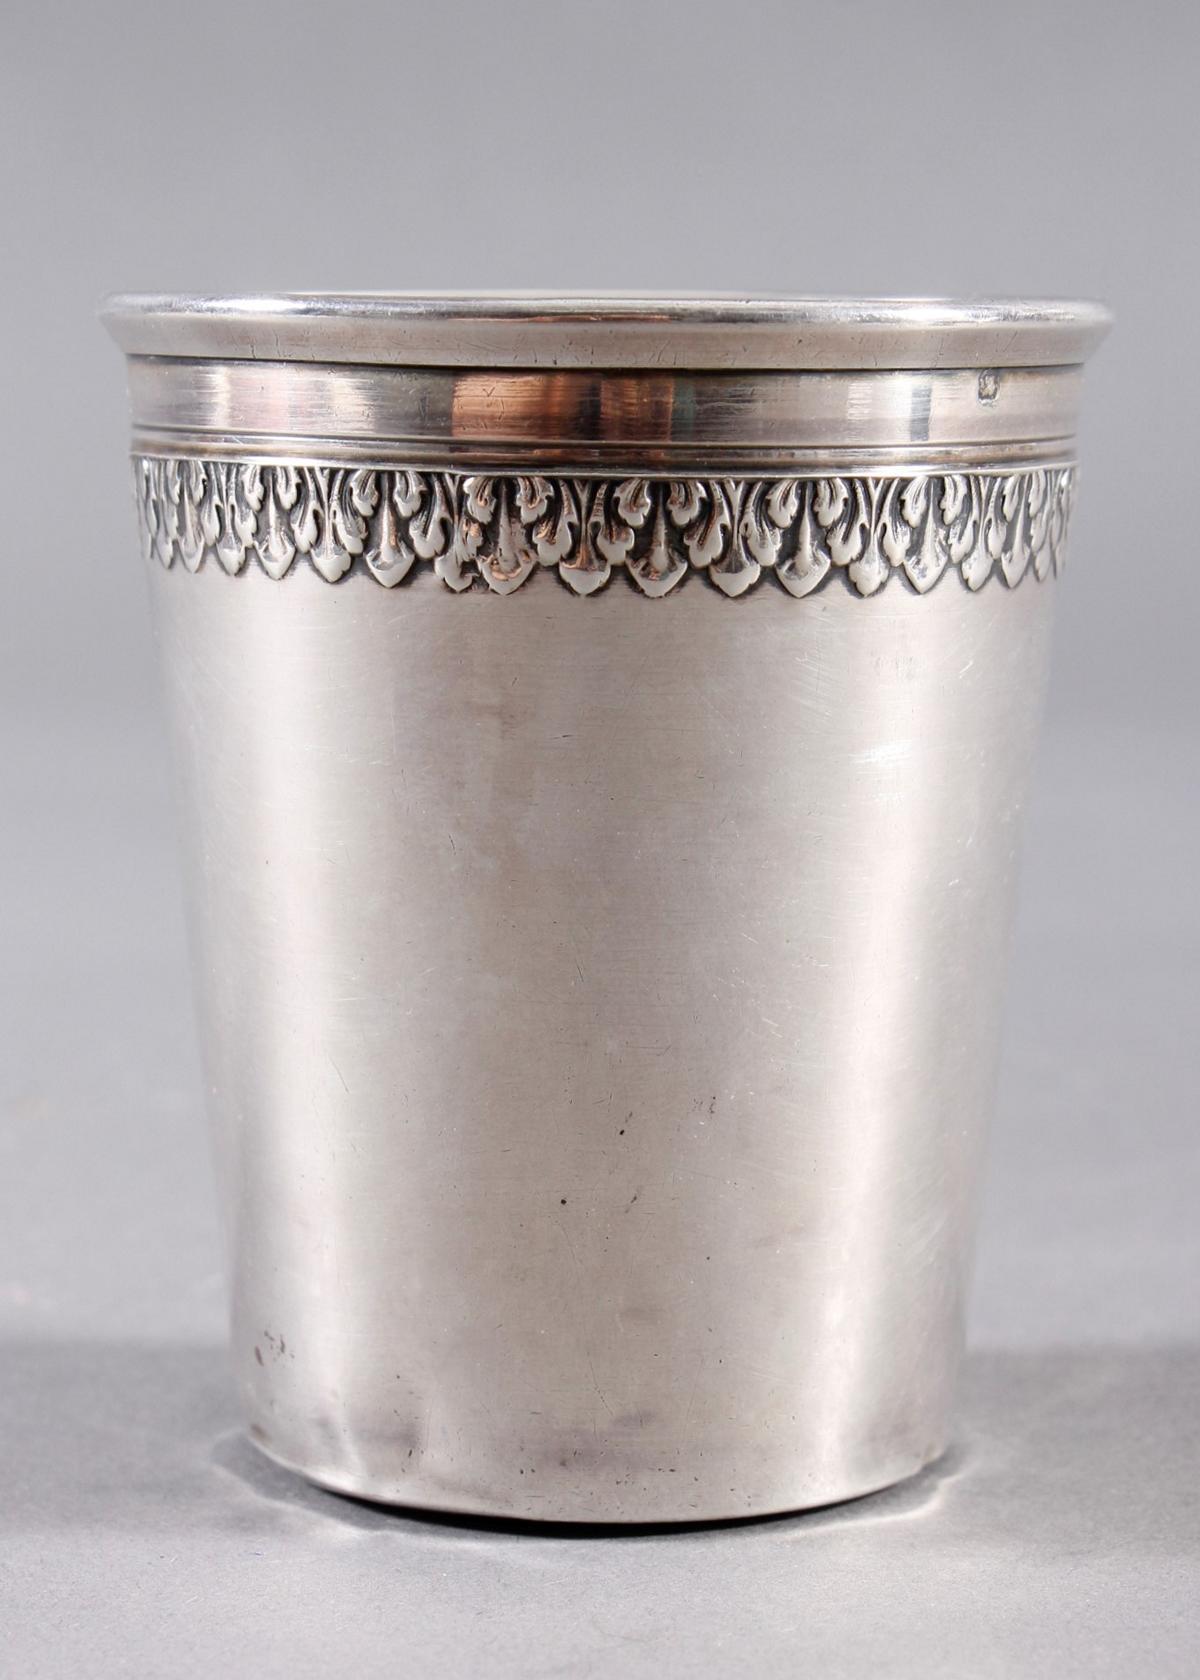 Silberbecher, Frankreich ab 1838, Silber 950